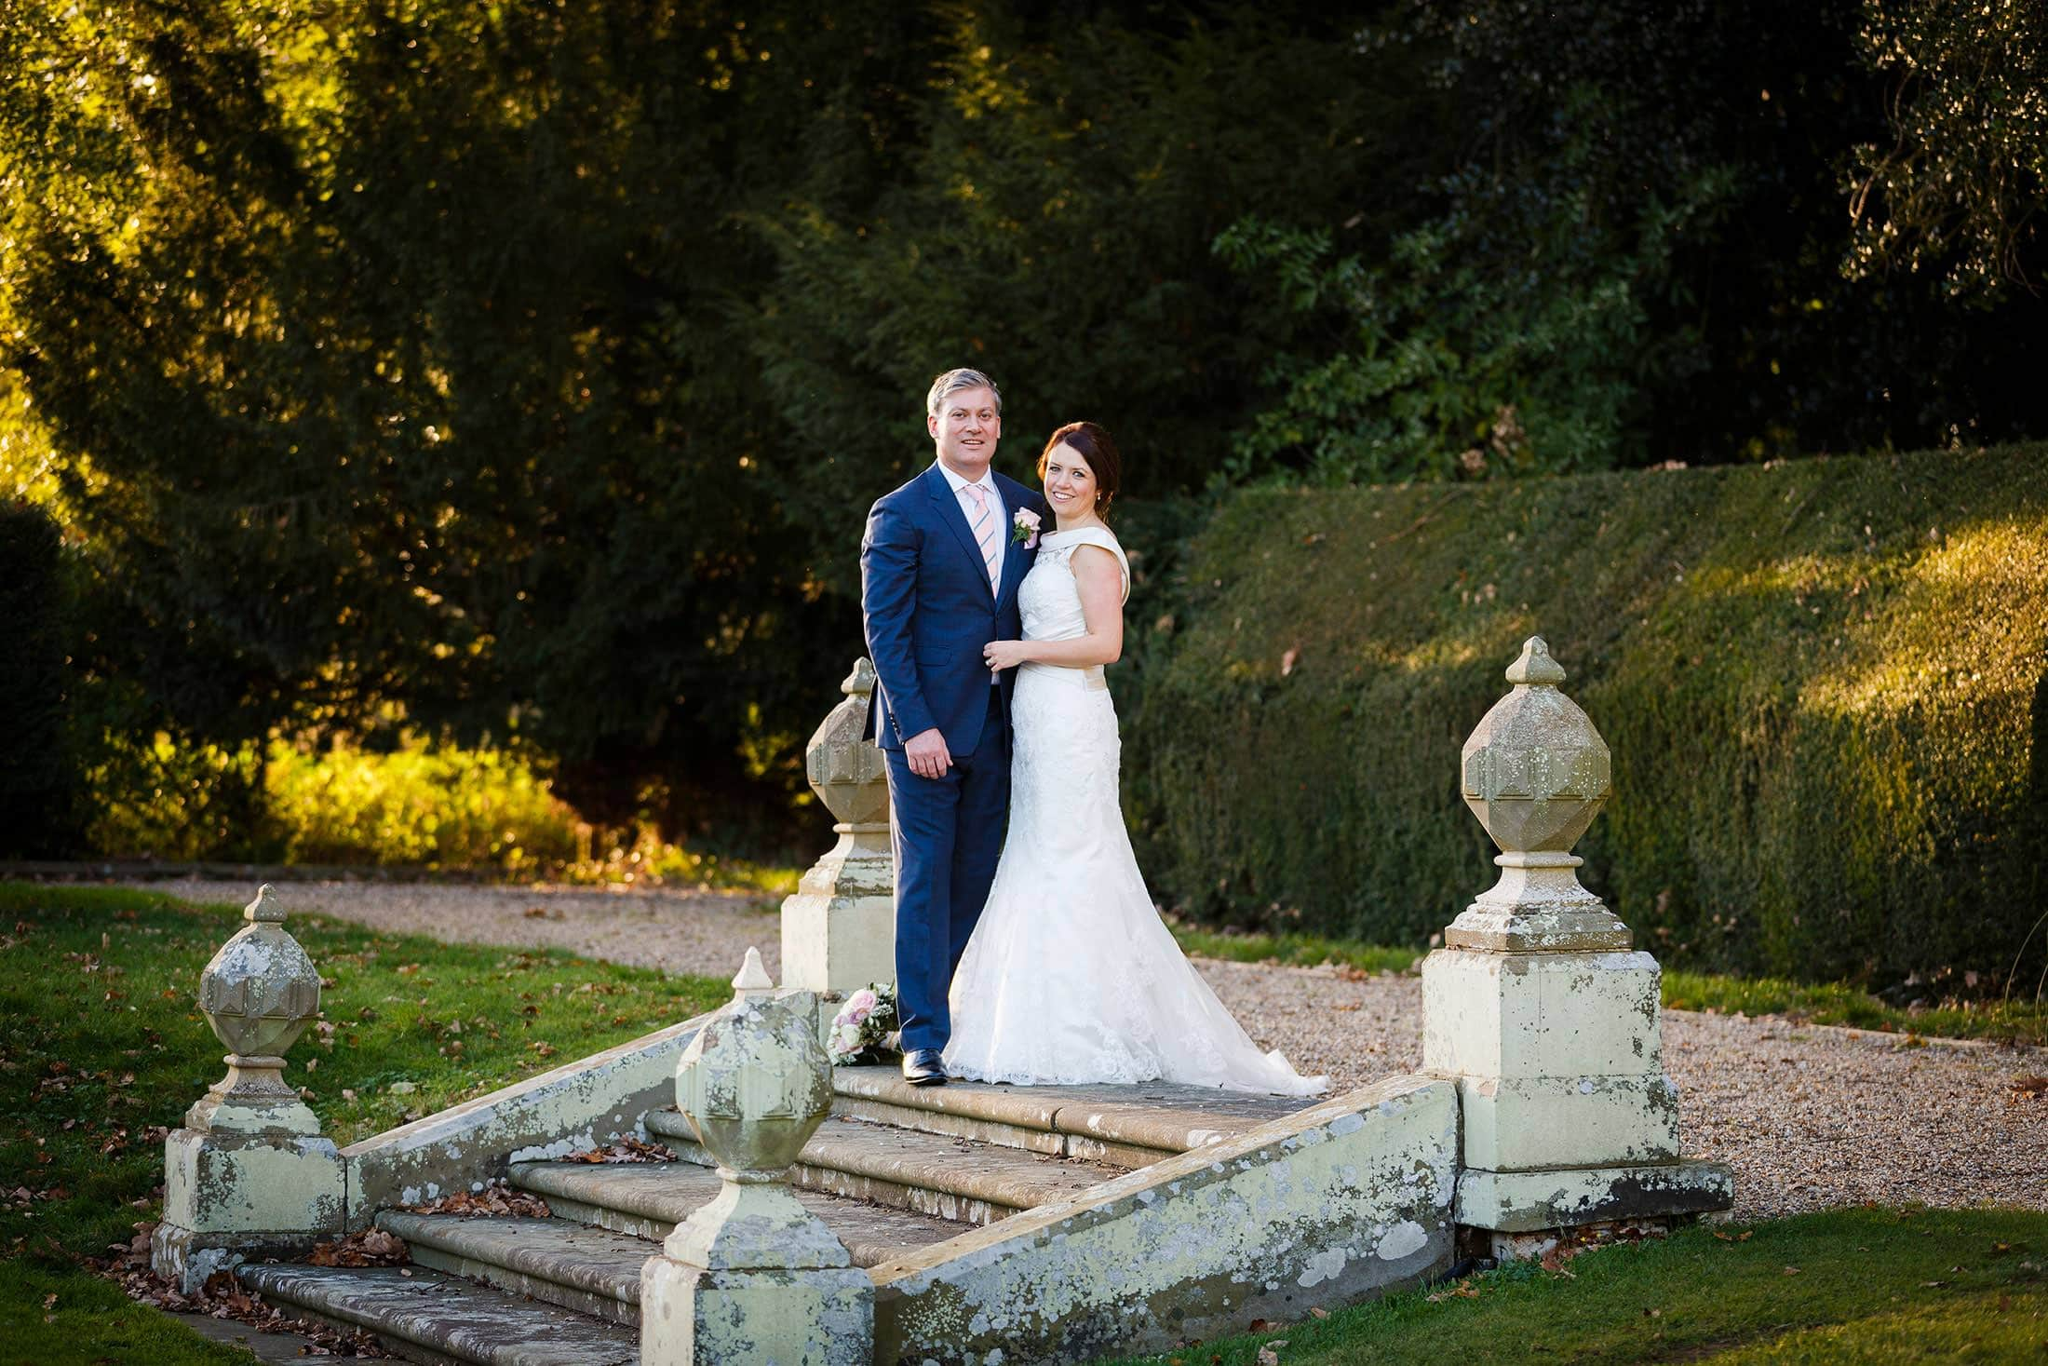 HENGRAVE HALL WEDDING PHOTOGRAPHER OF LAURA & SELIM